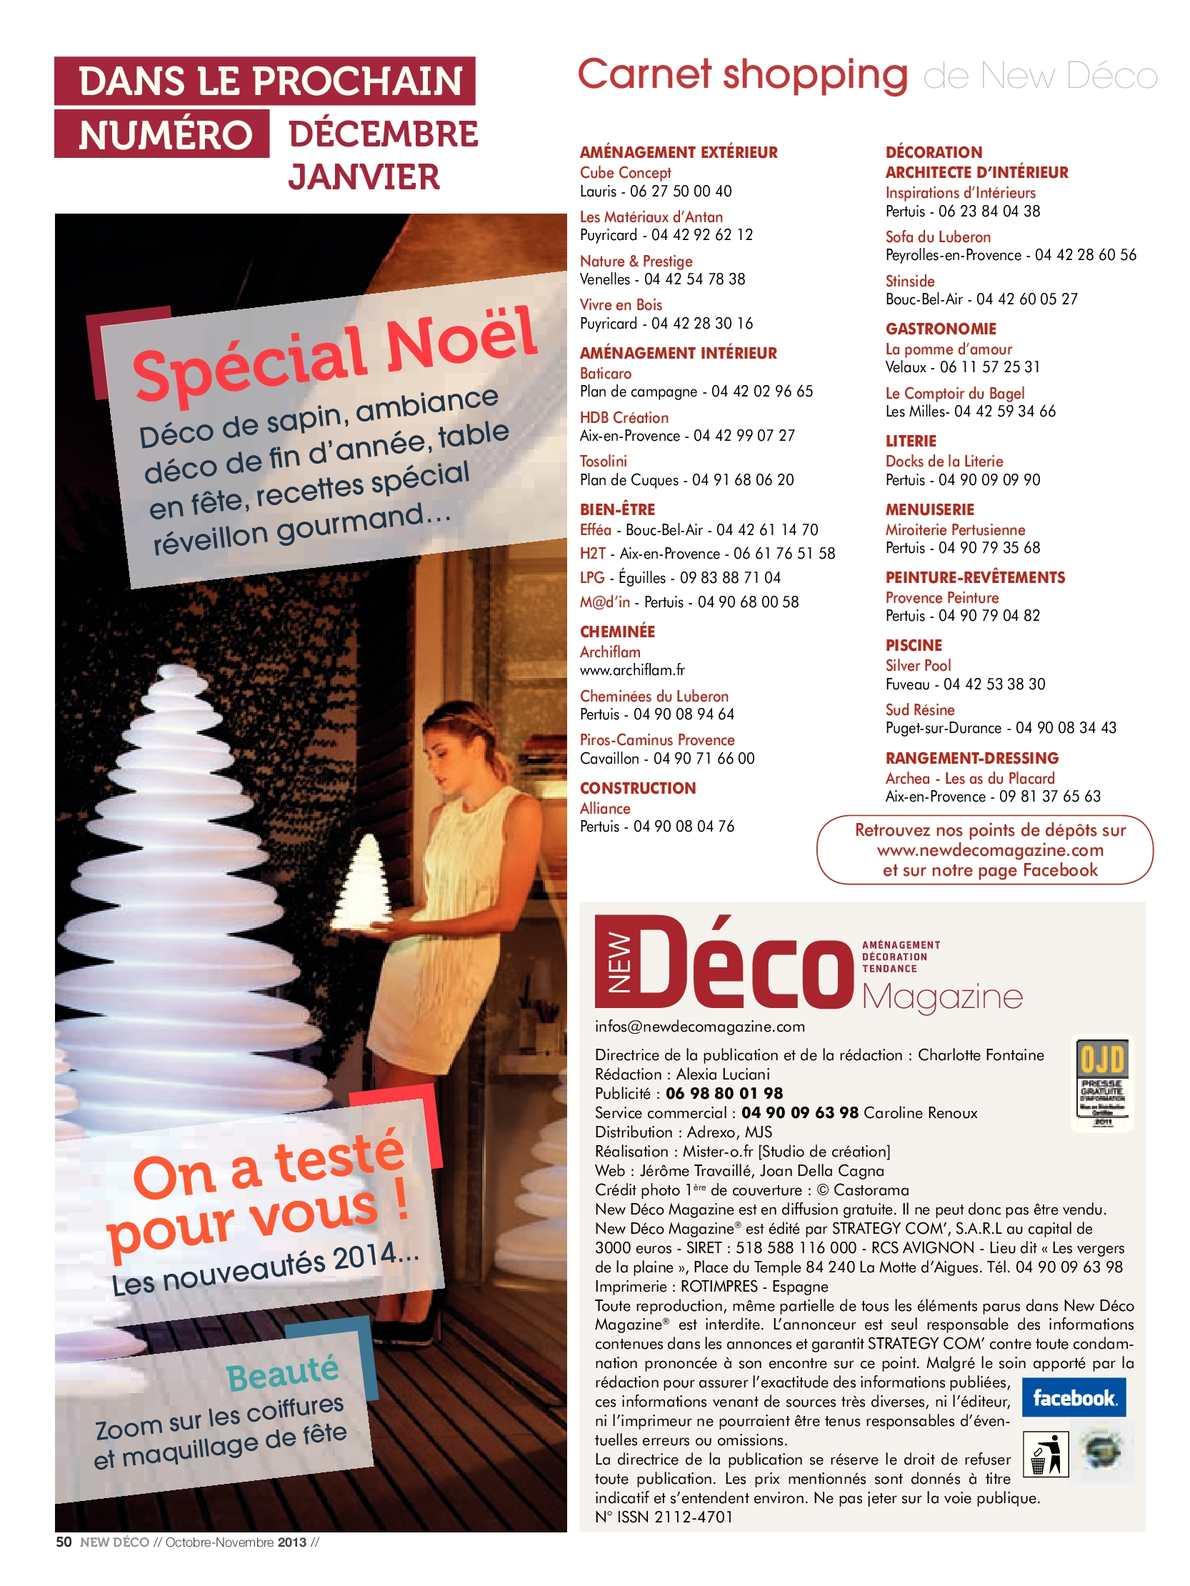 New Deco Magazine Octobre Novembre 2013 Calameo Downloader